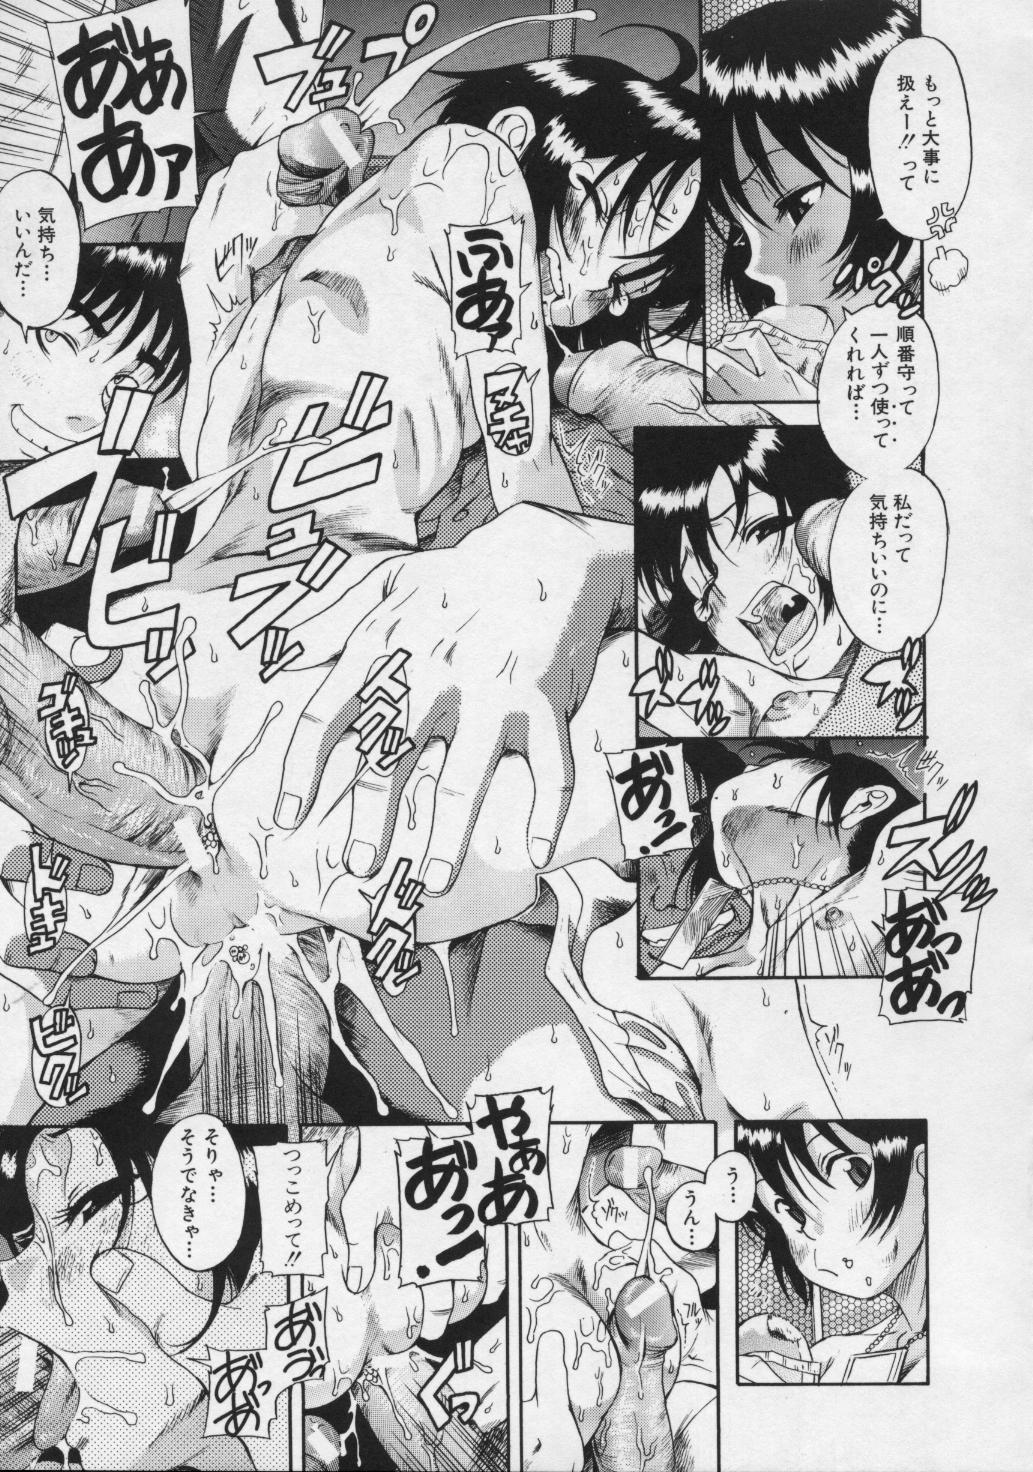 Kimi no Na o Yobeba - If I call your name. 52